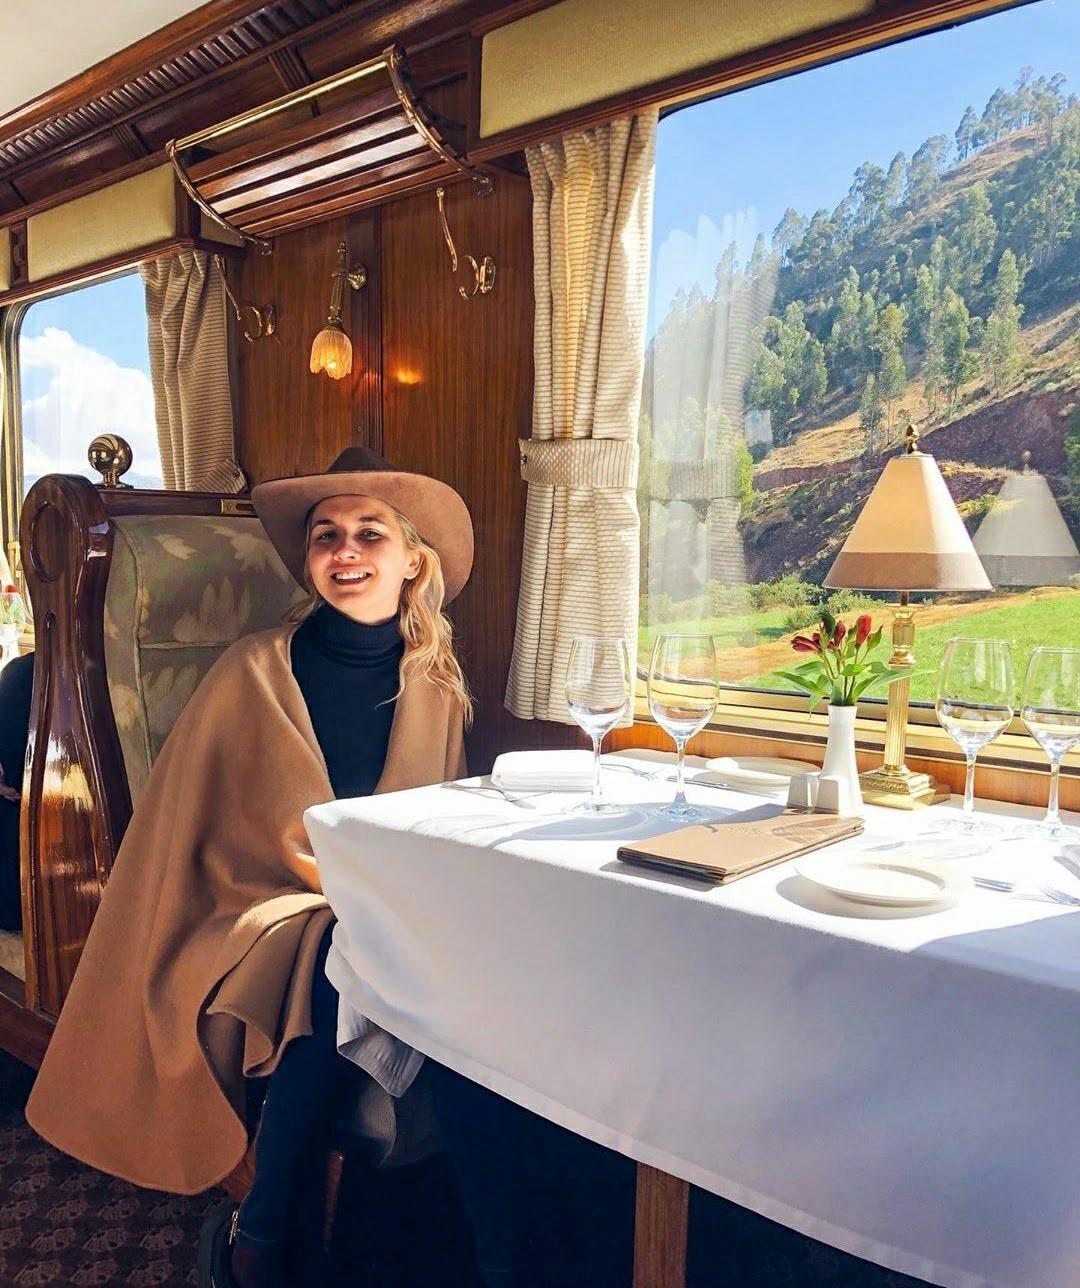 3)Hiram Bingham Orient Express